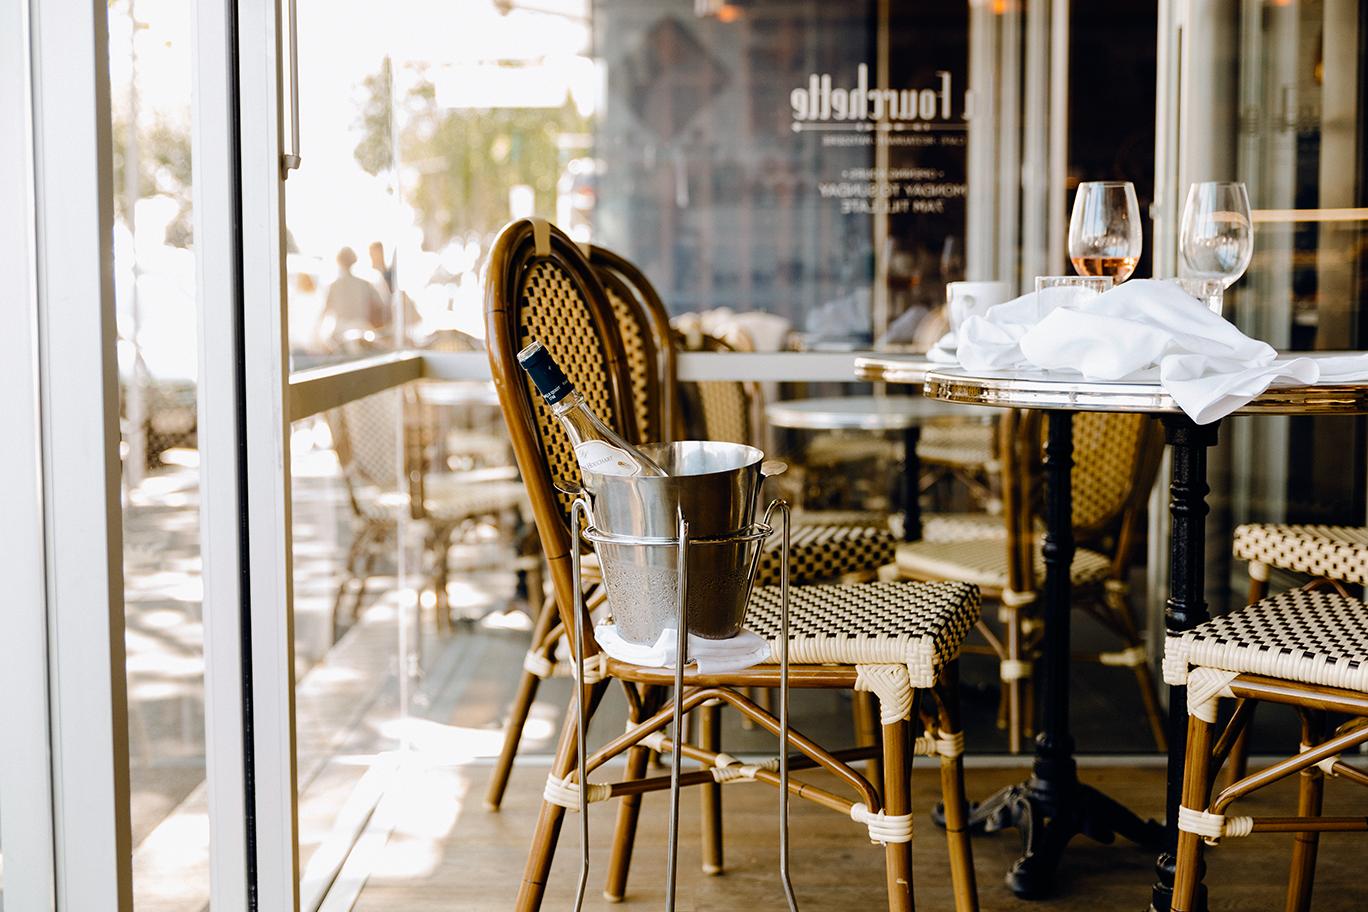 La-Fourchette-Restaurant-Brasserie02.png